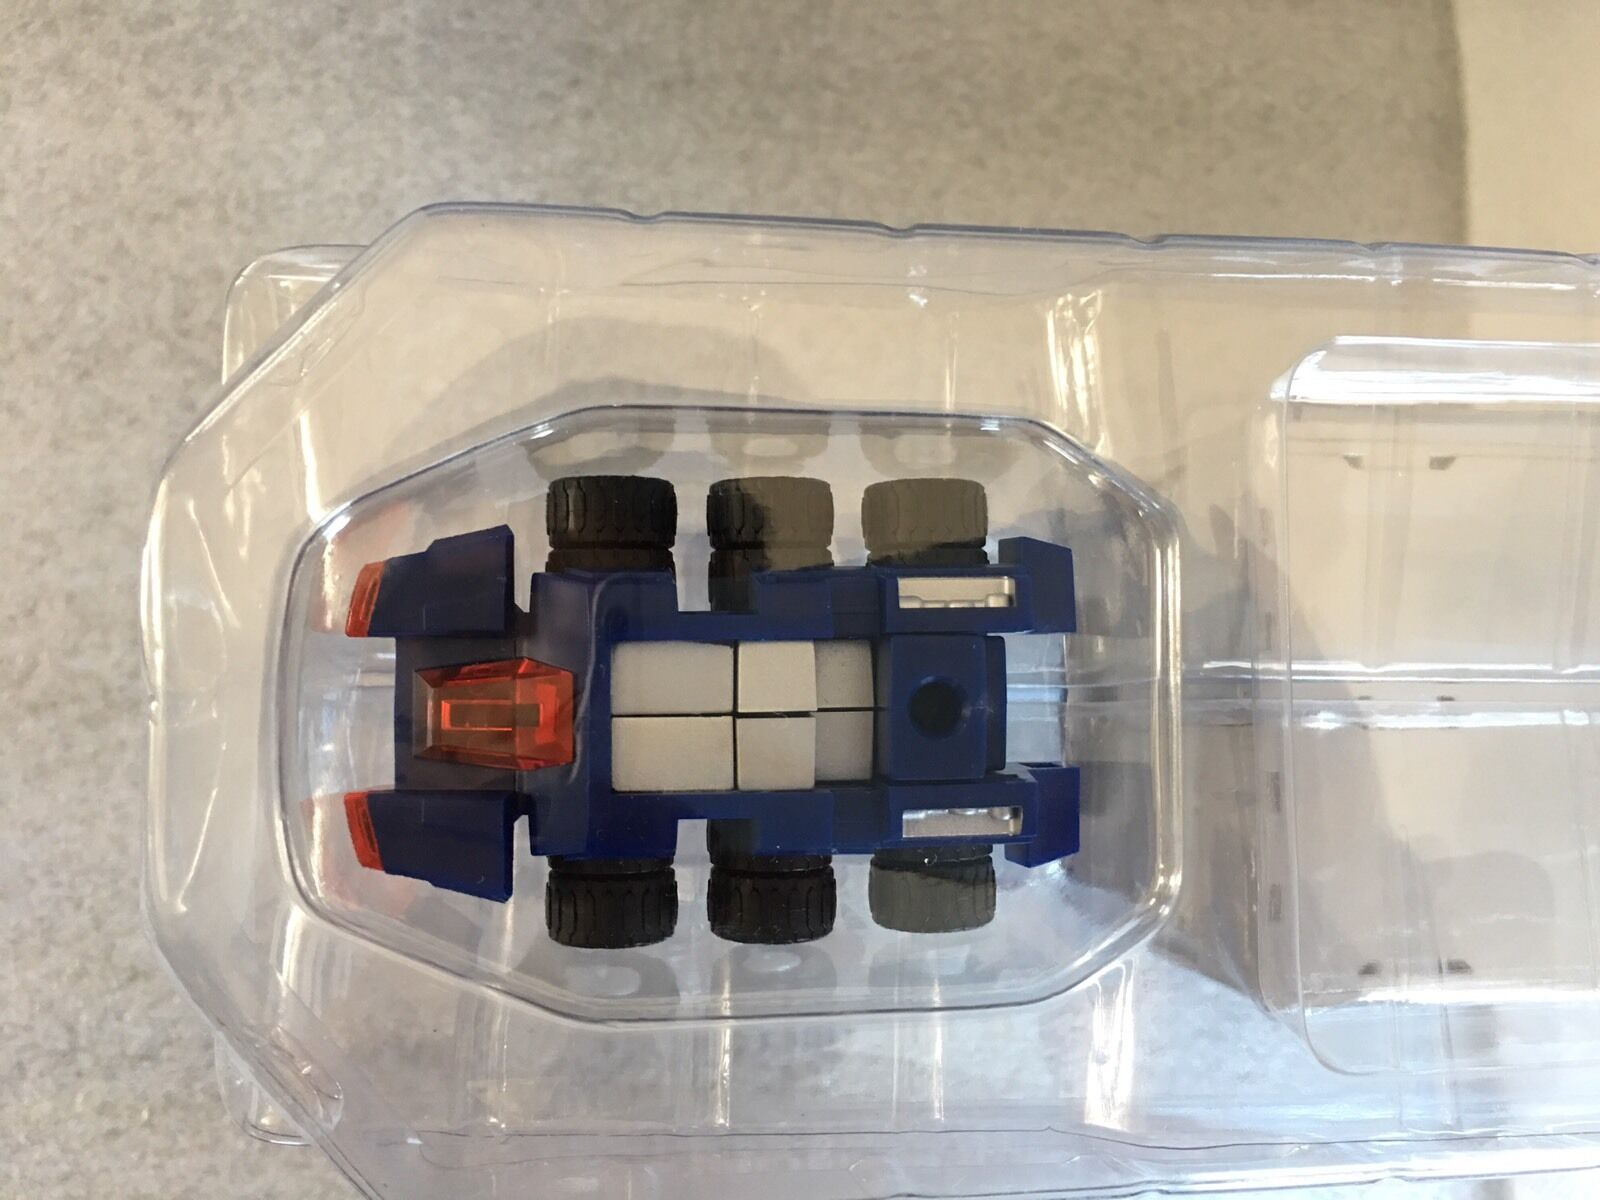 FansProject TFX-02 Parallax Parallax Parallax G3 Trailer for Transformers Classics Optimus Prime e018b9